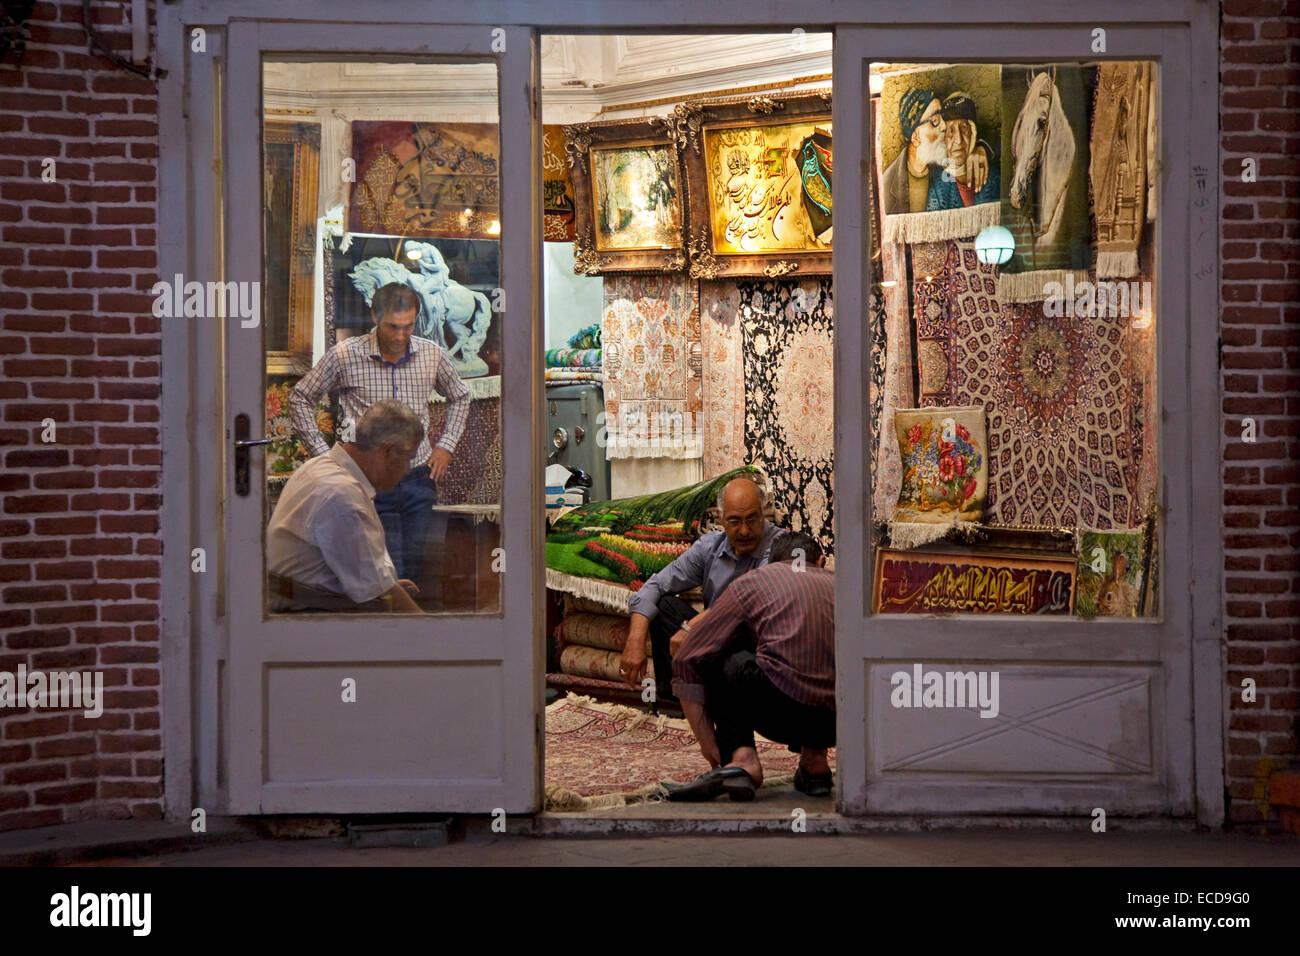 Iranian vendor selling carpets in carpet store in the old historic bazaar of the city Tabriz, East Azerbaijan, Iran - Stock Image